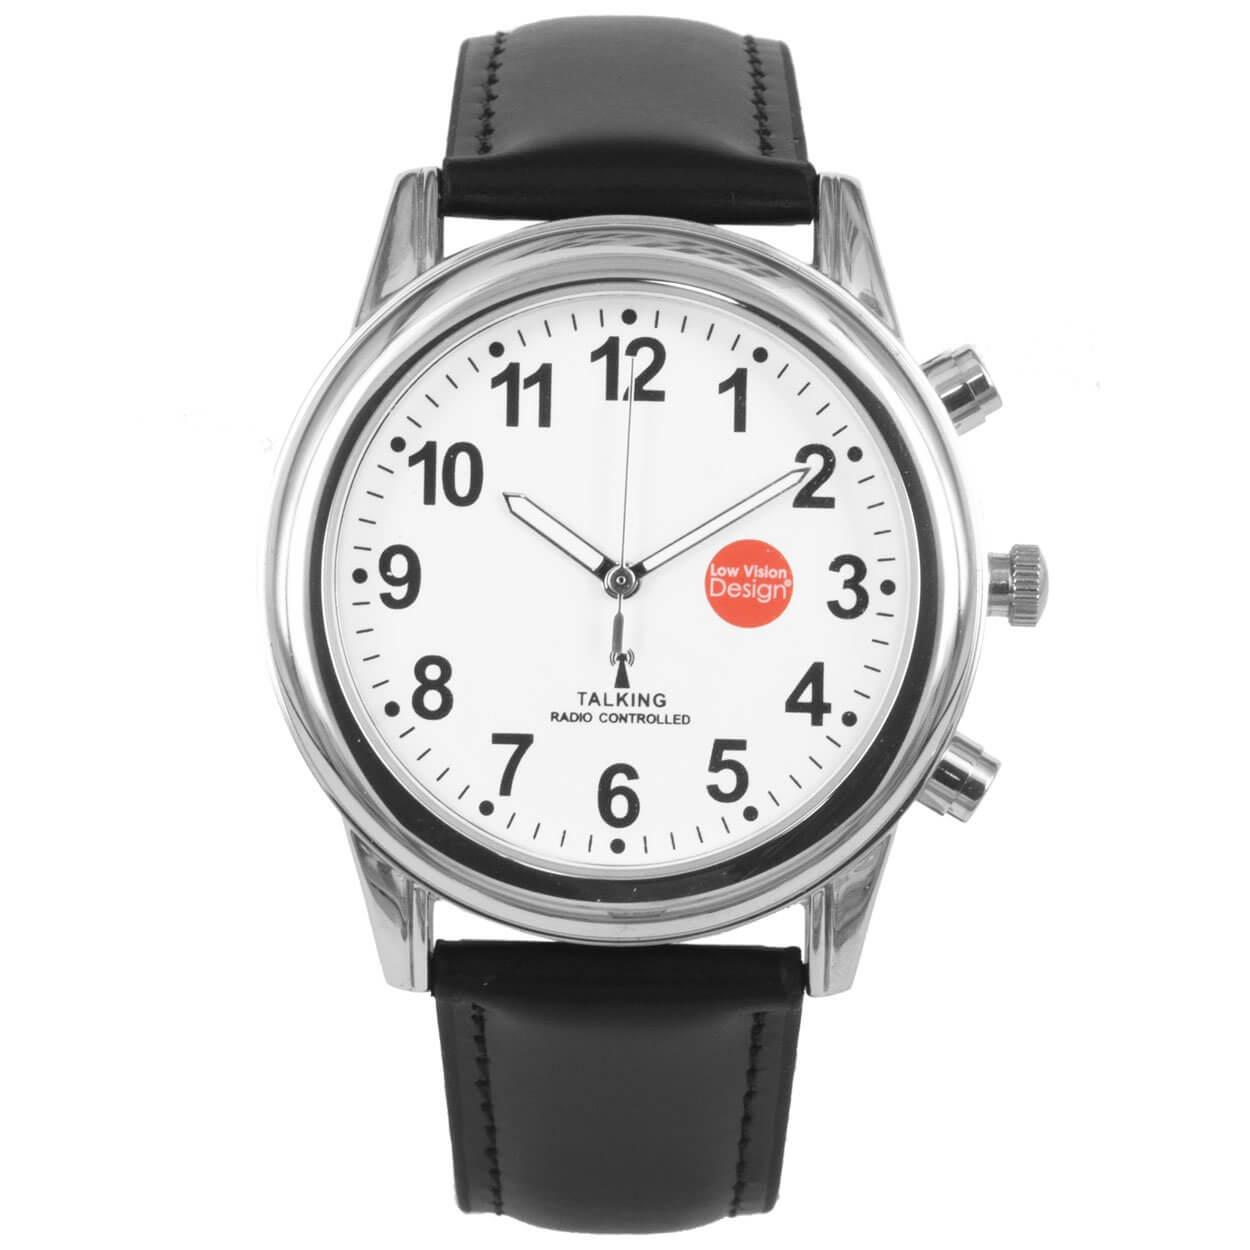 nederlands sprekend horloge atoomgestuurd unisex